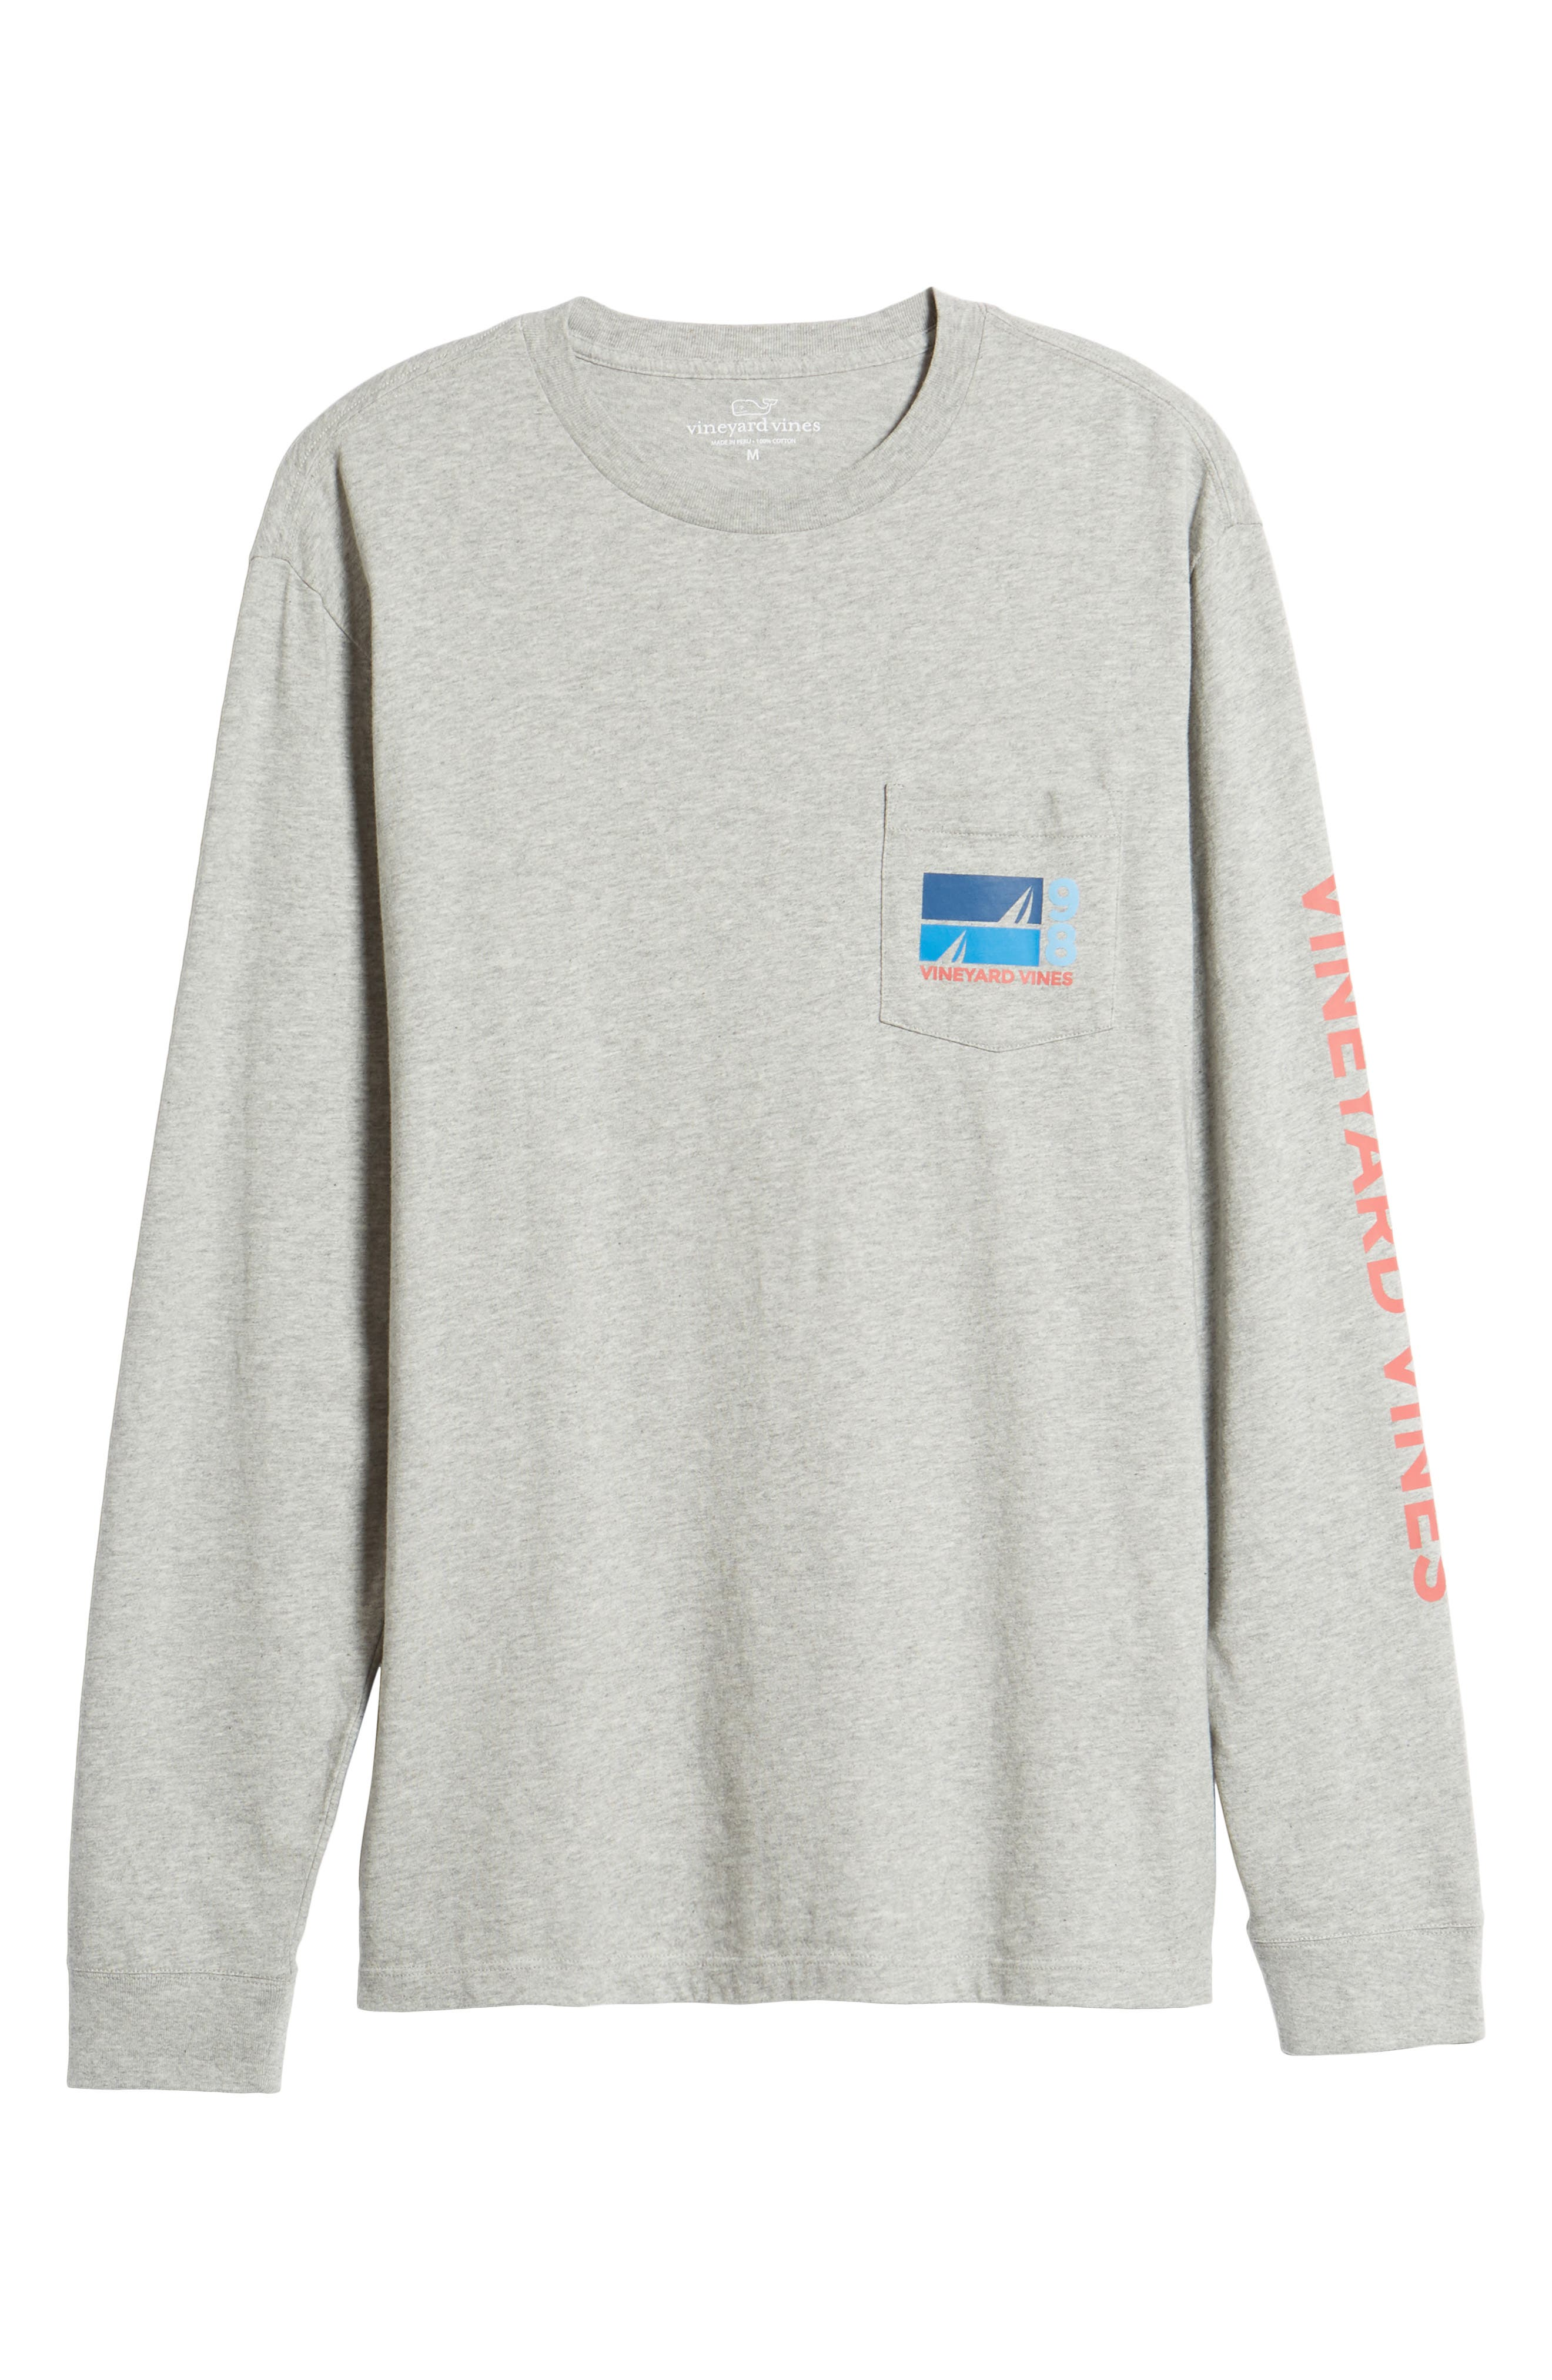 Sailing Blue Regular Fit Crewneck T-Shirt,                             Alternate thumbnail 6, color,                             Gray Heather